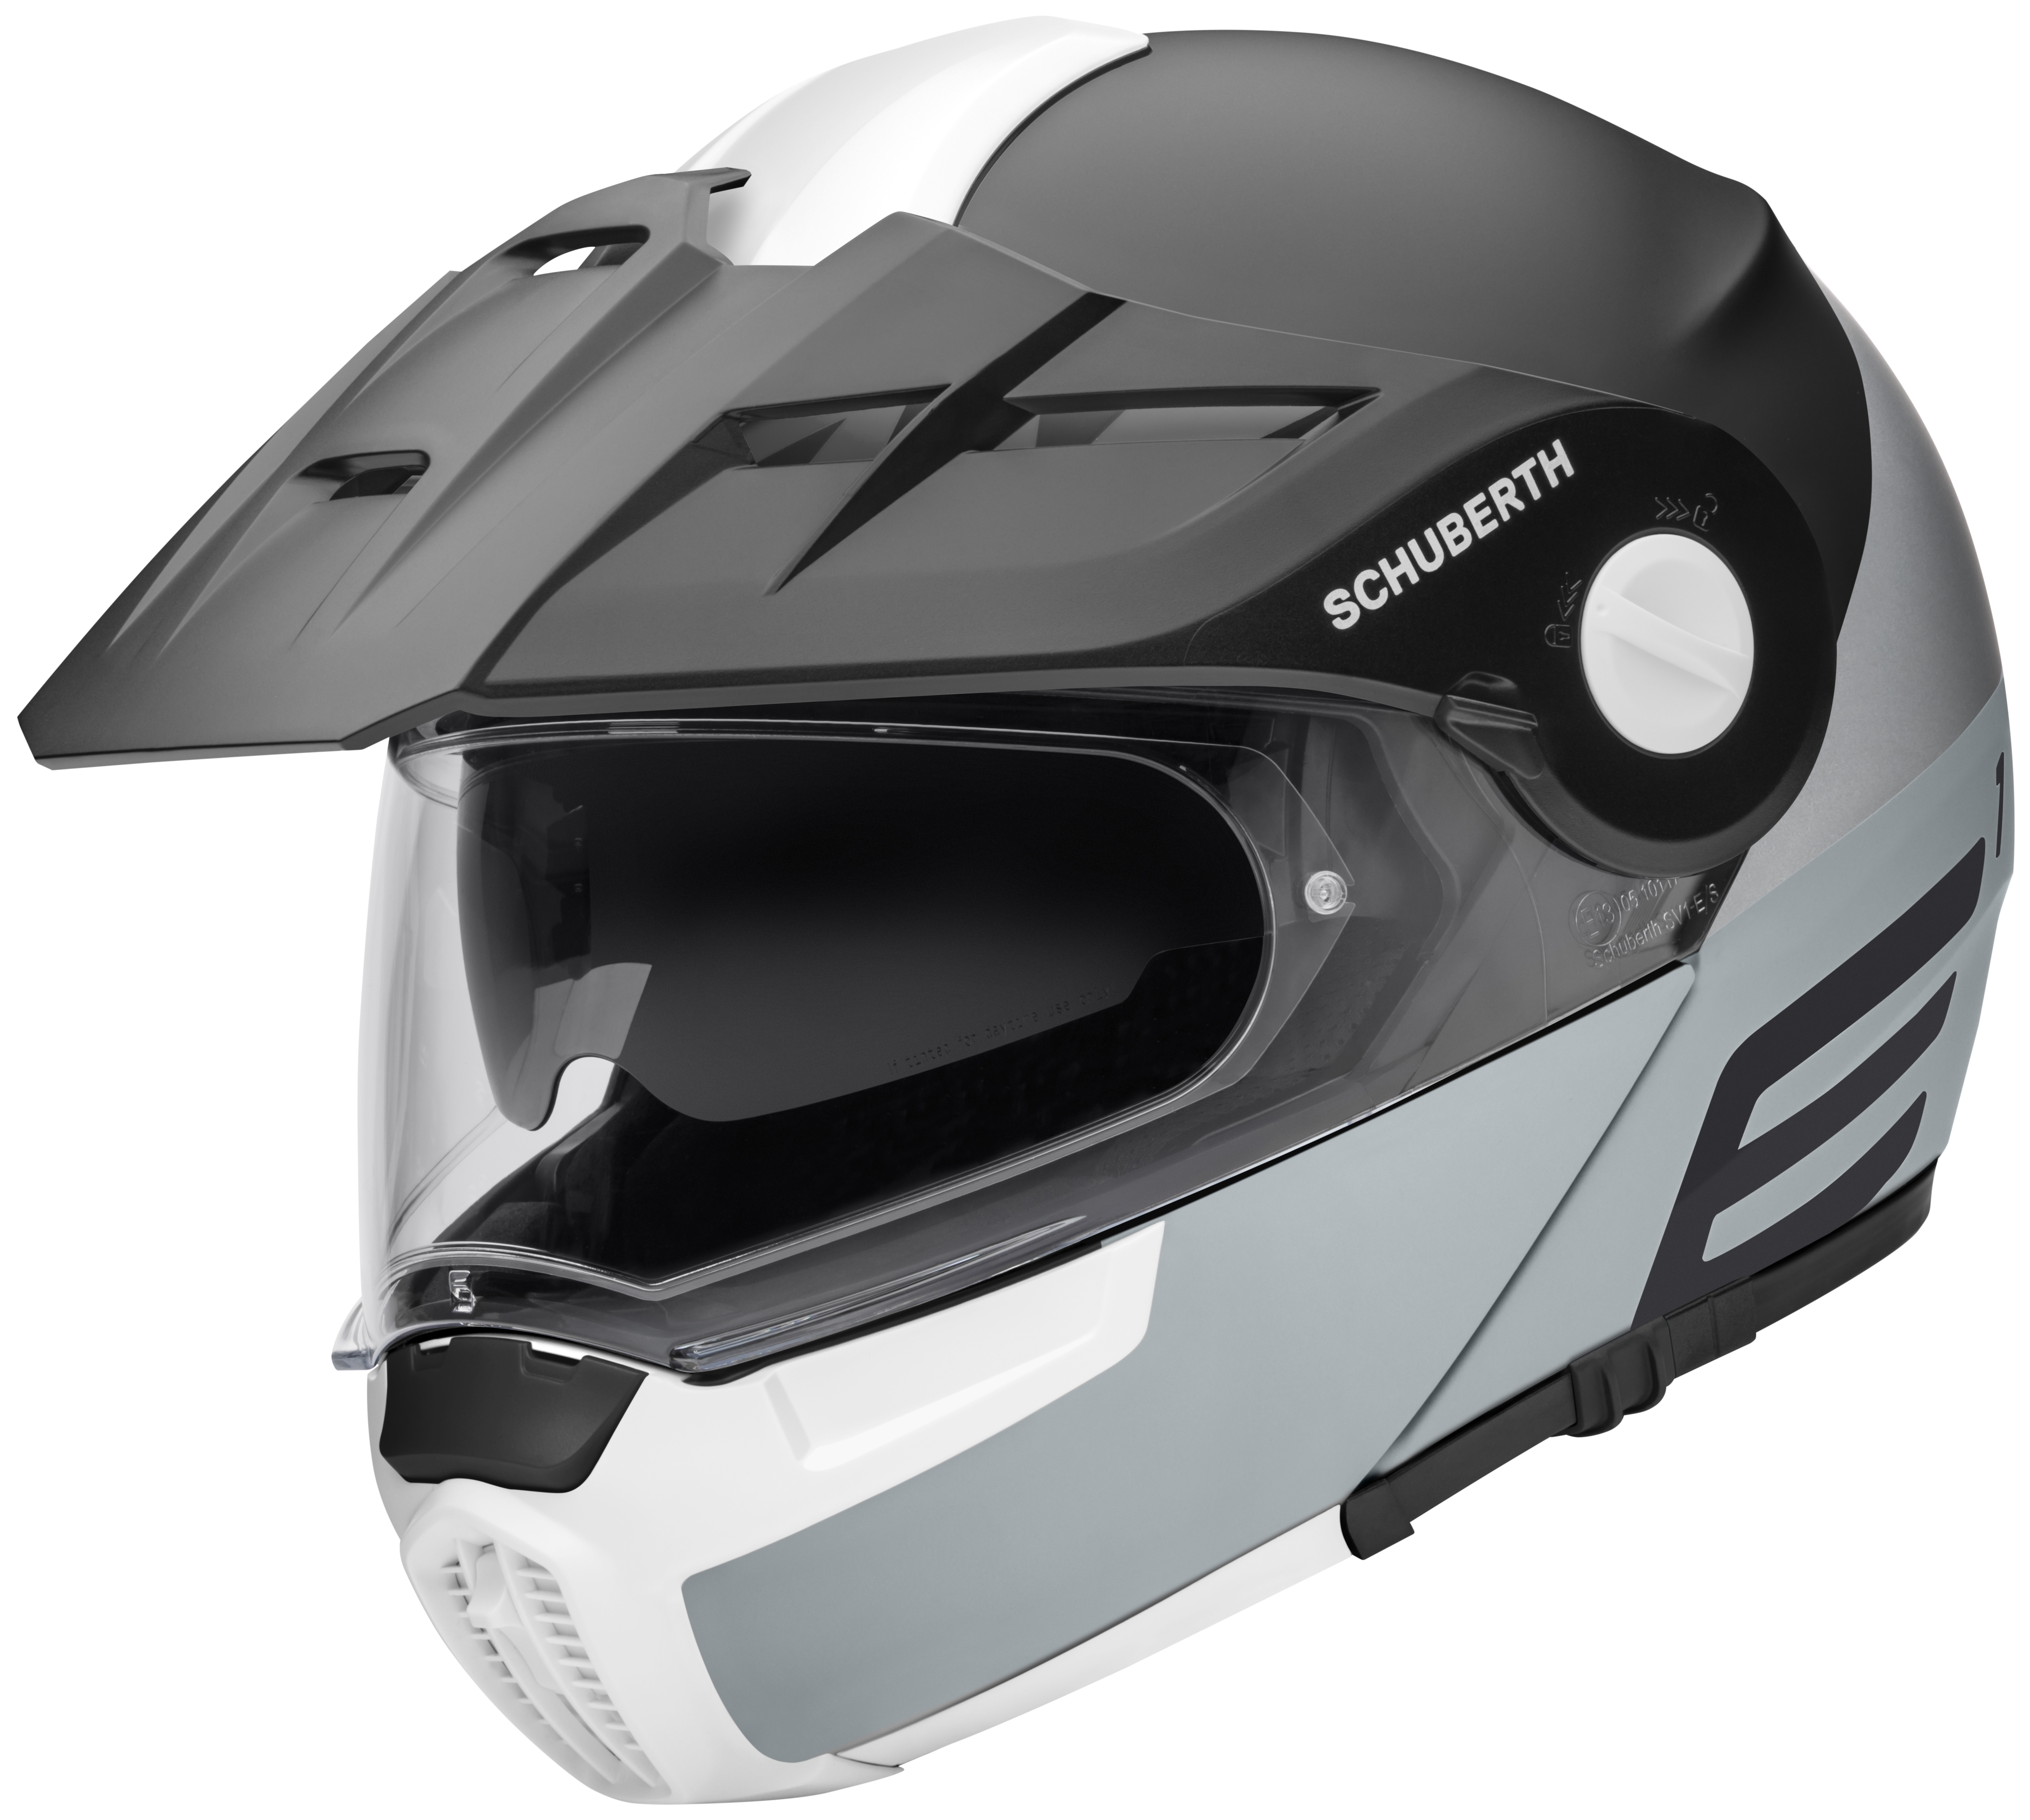 ba400dd87e033 Schuberth E1 Cut Helmet - RevZilla